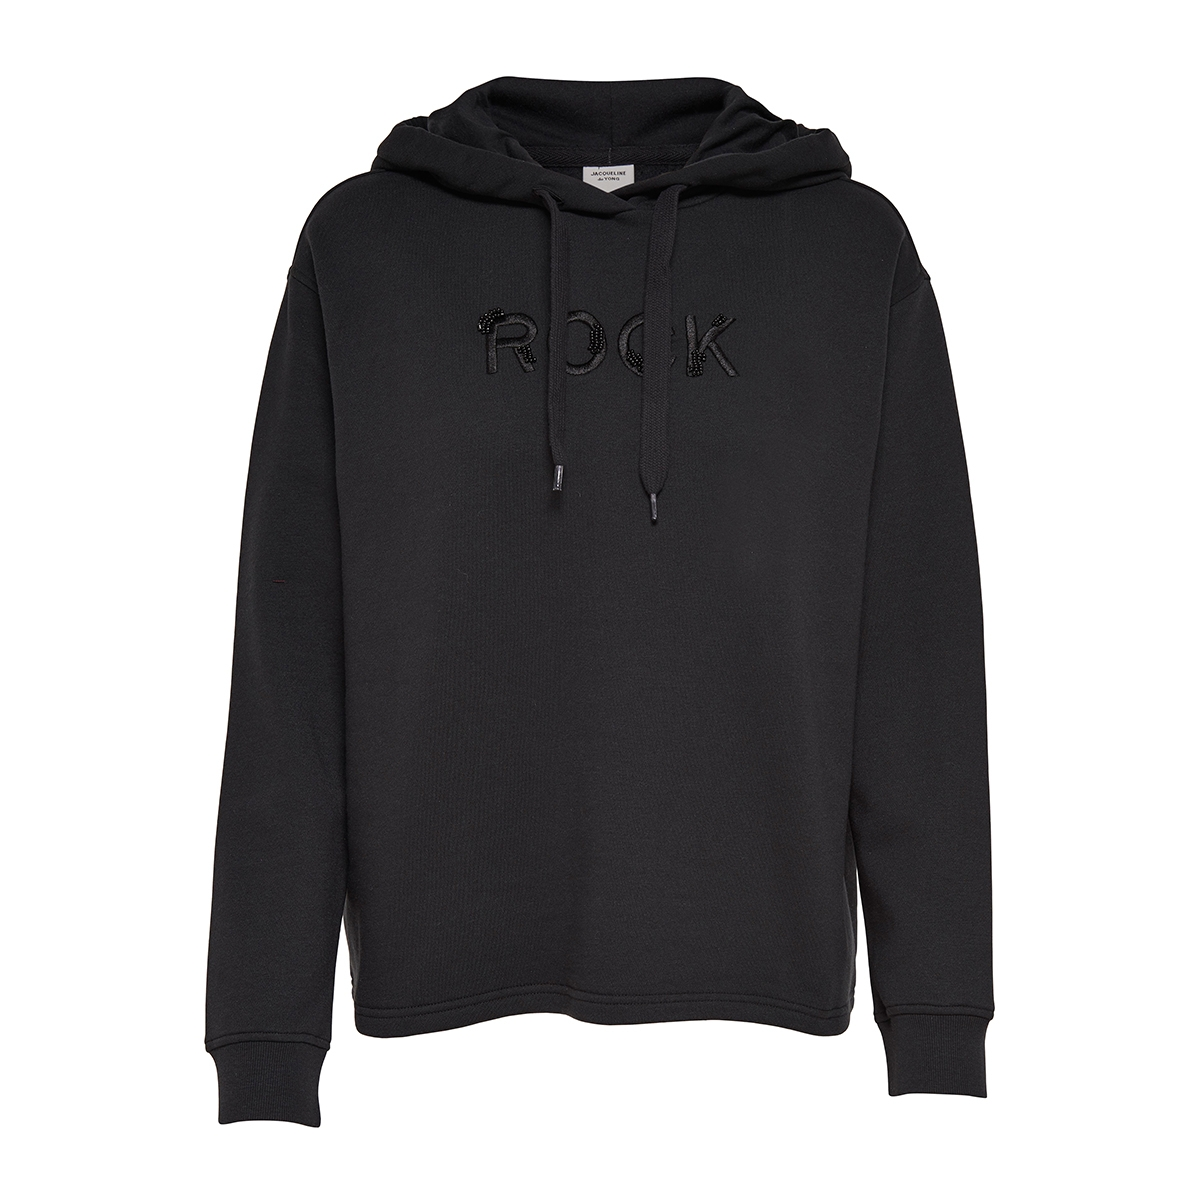 jdykora l/s emb hood sweat jrs 15161166 jacqueline de yong sweater black/rock embro